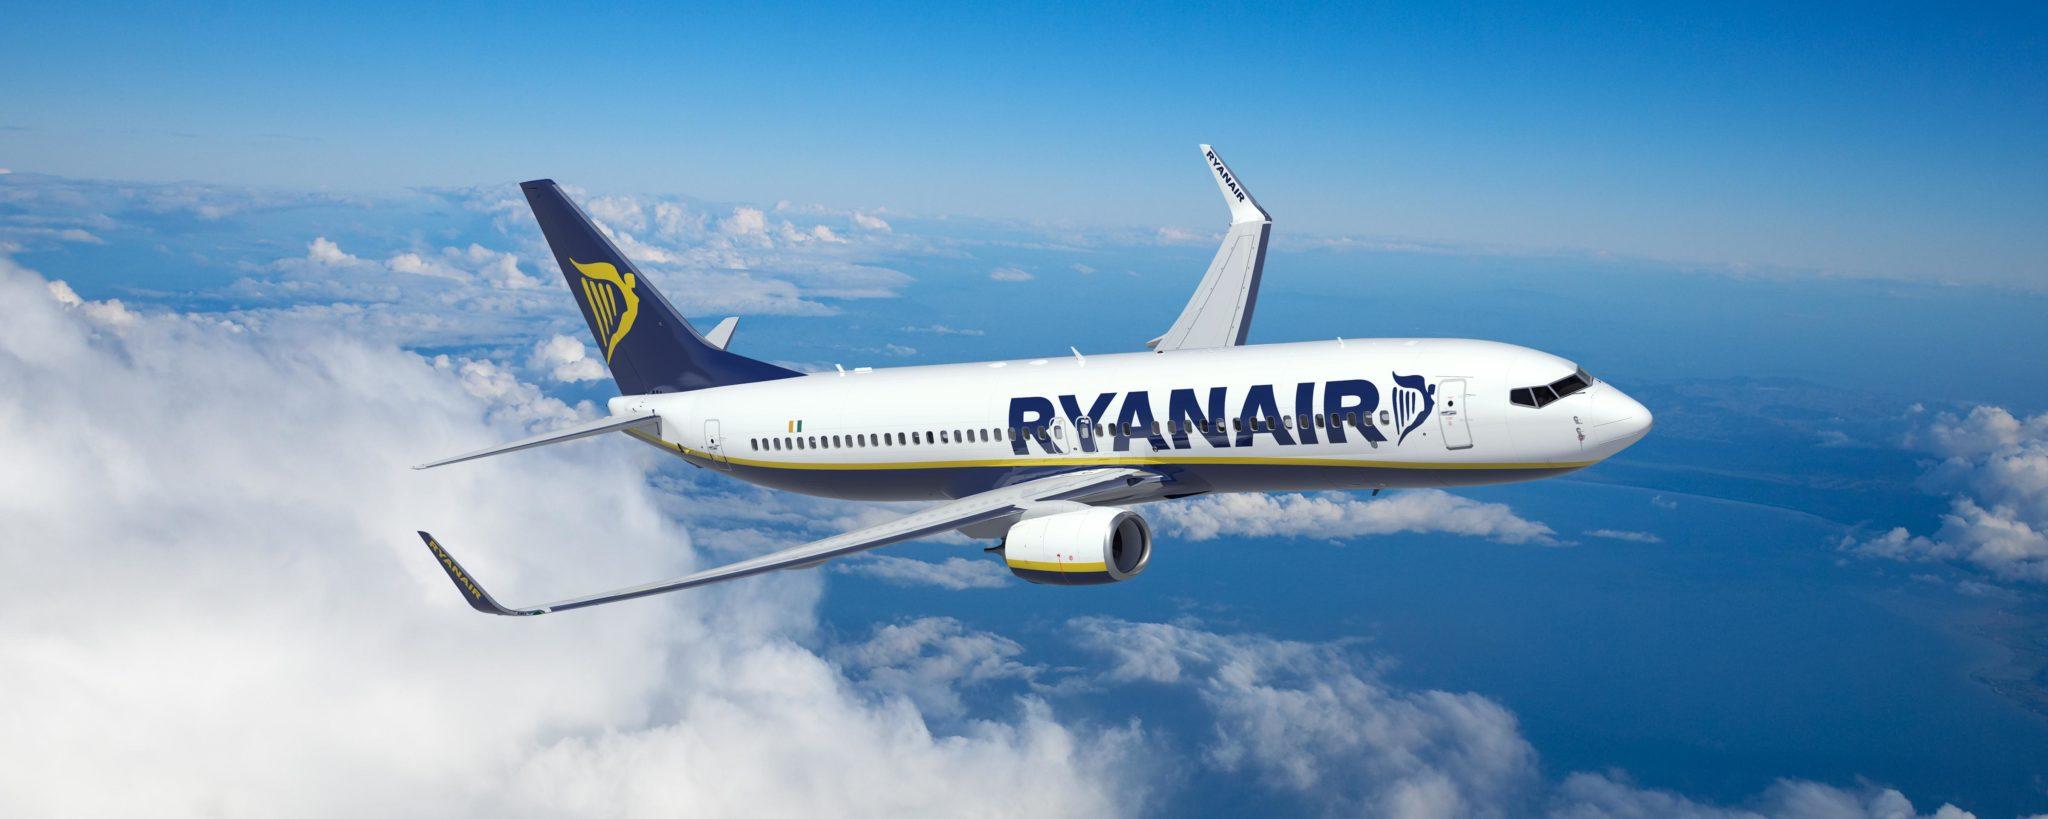 Szef Ryanaira: